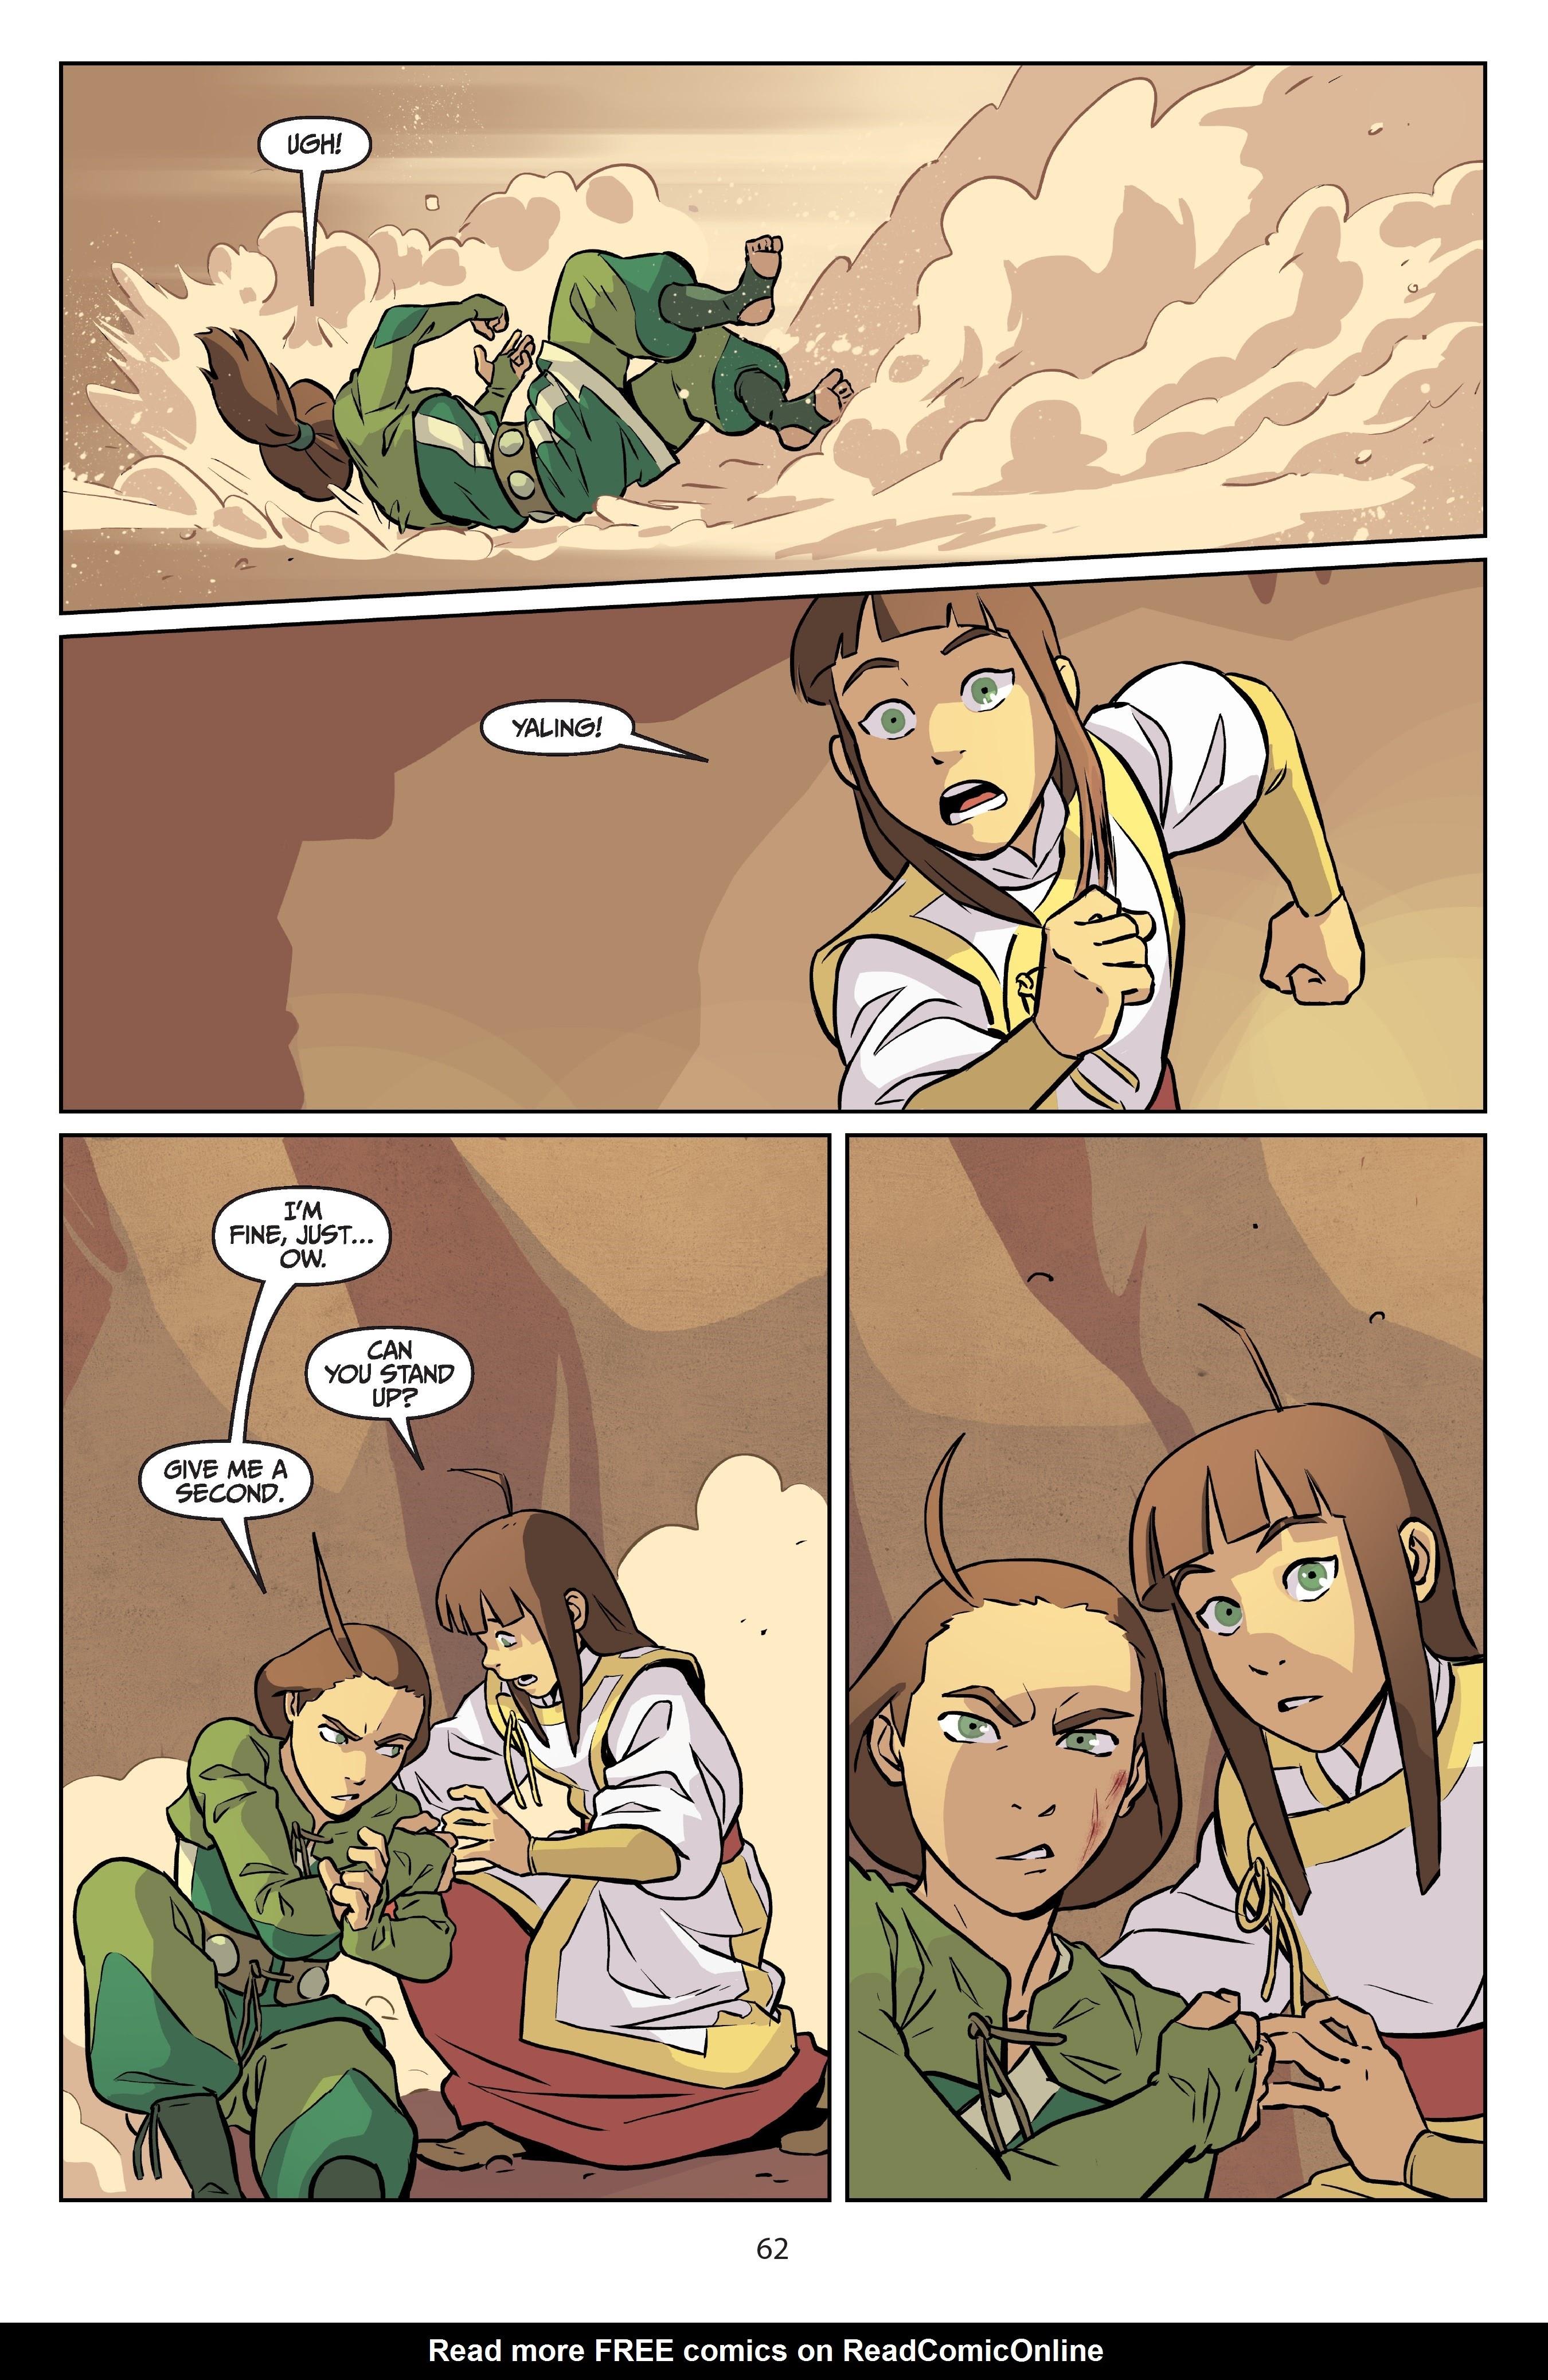 Nickelodeon Avatar: The Last Airbender - Imbalance TPB_2 Page 62